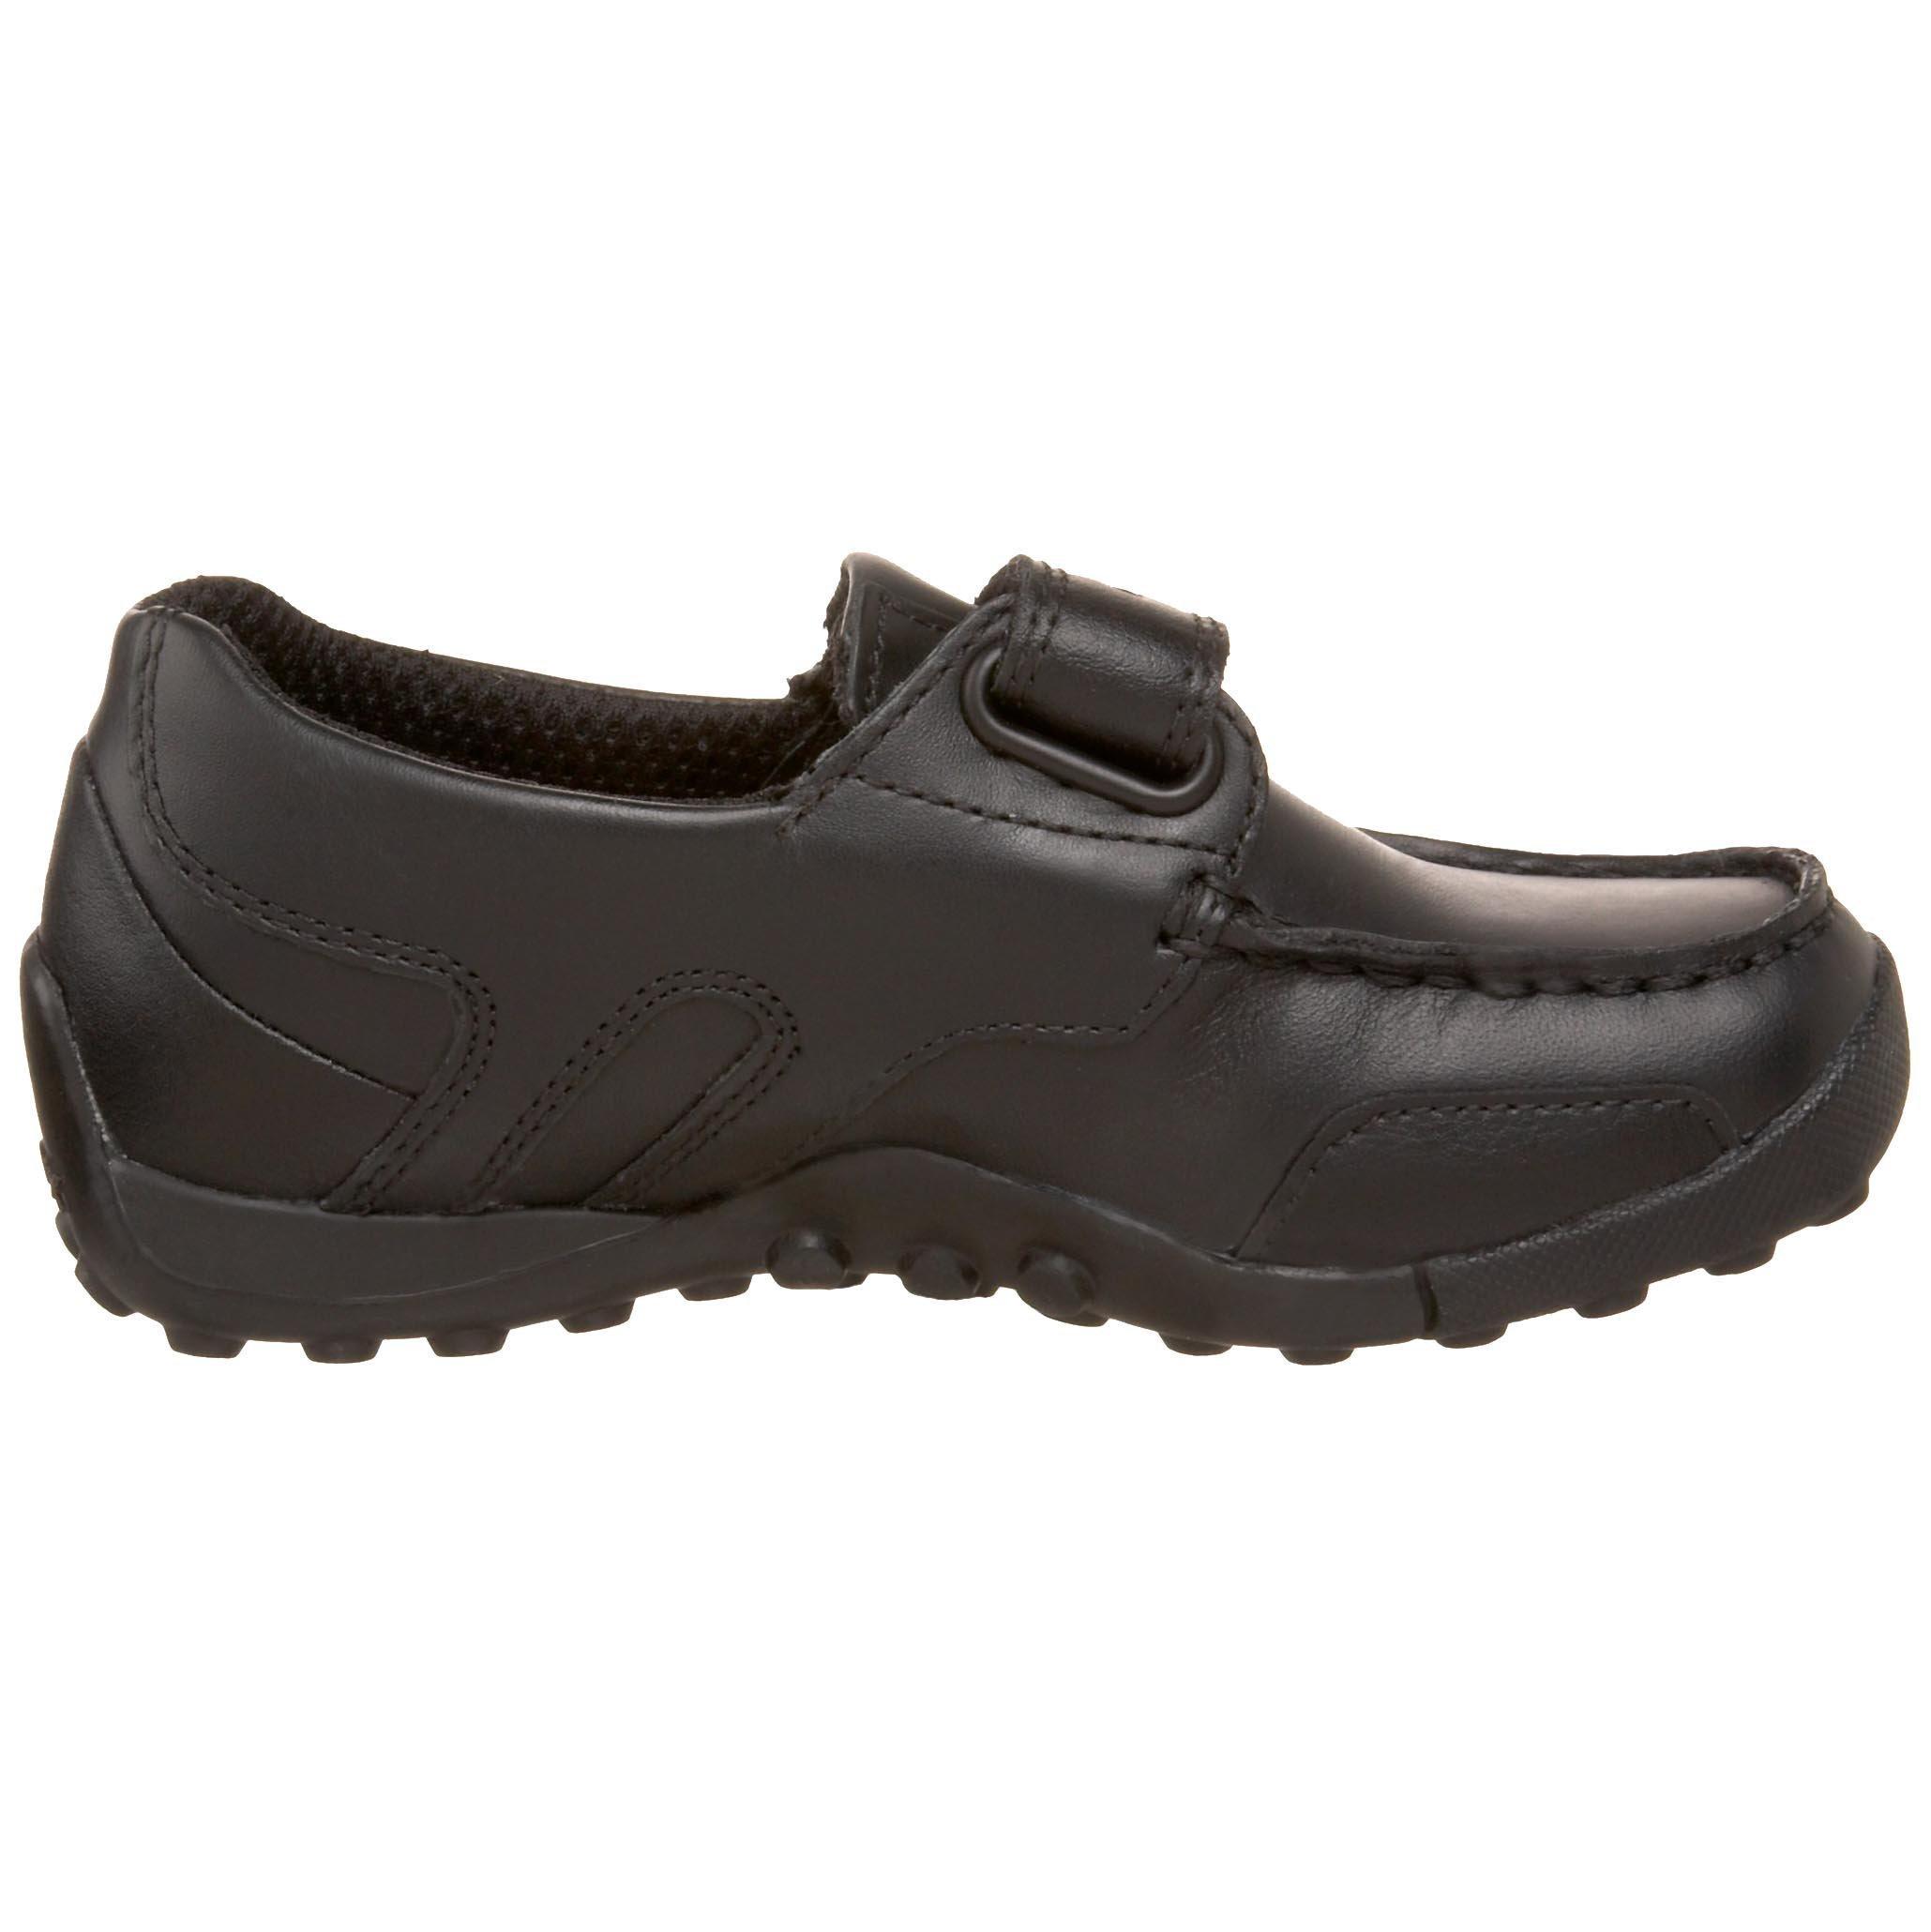 Geox Boy's JR W.SNAKE MOCASSINO Shoe,black,37 M EU Big Kid (5 US) by Geox (Image #6)